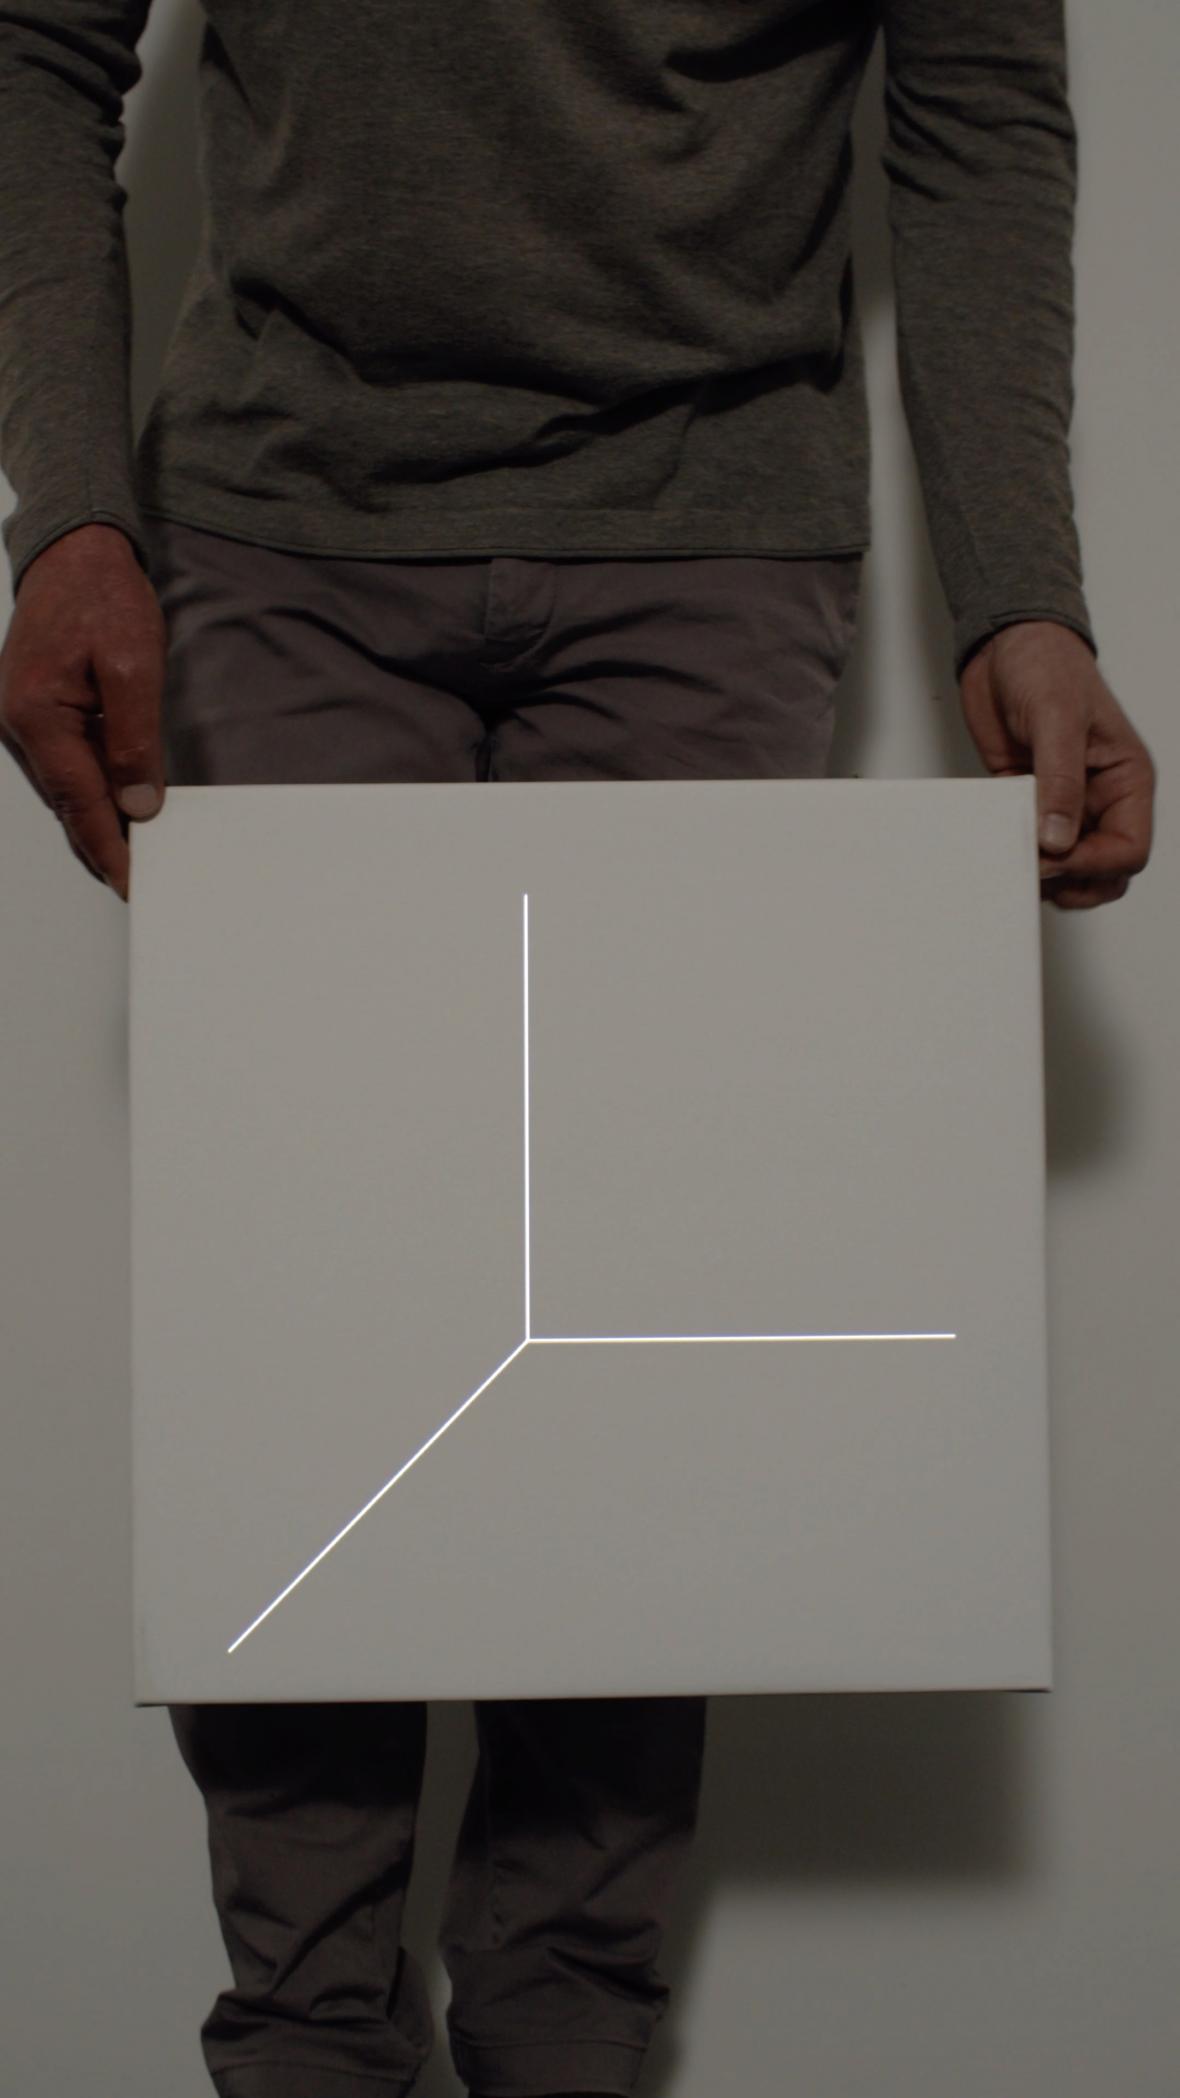 Daniel Hanzlík, Default Setting, 2021, video performance